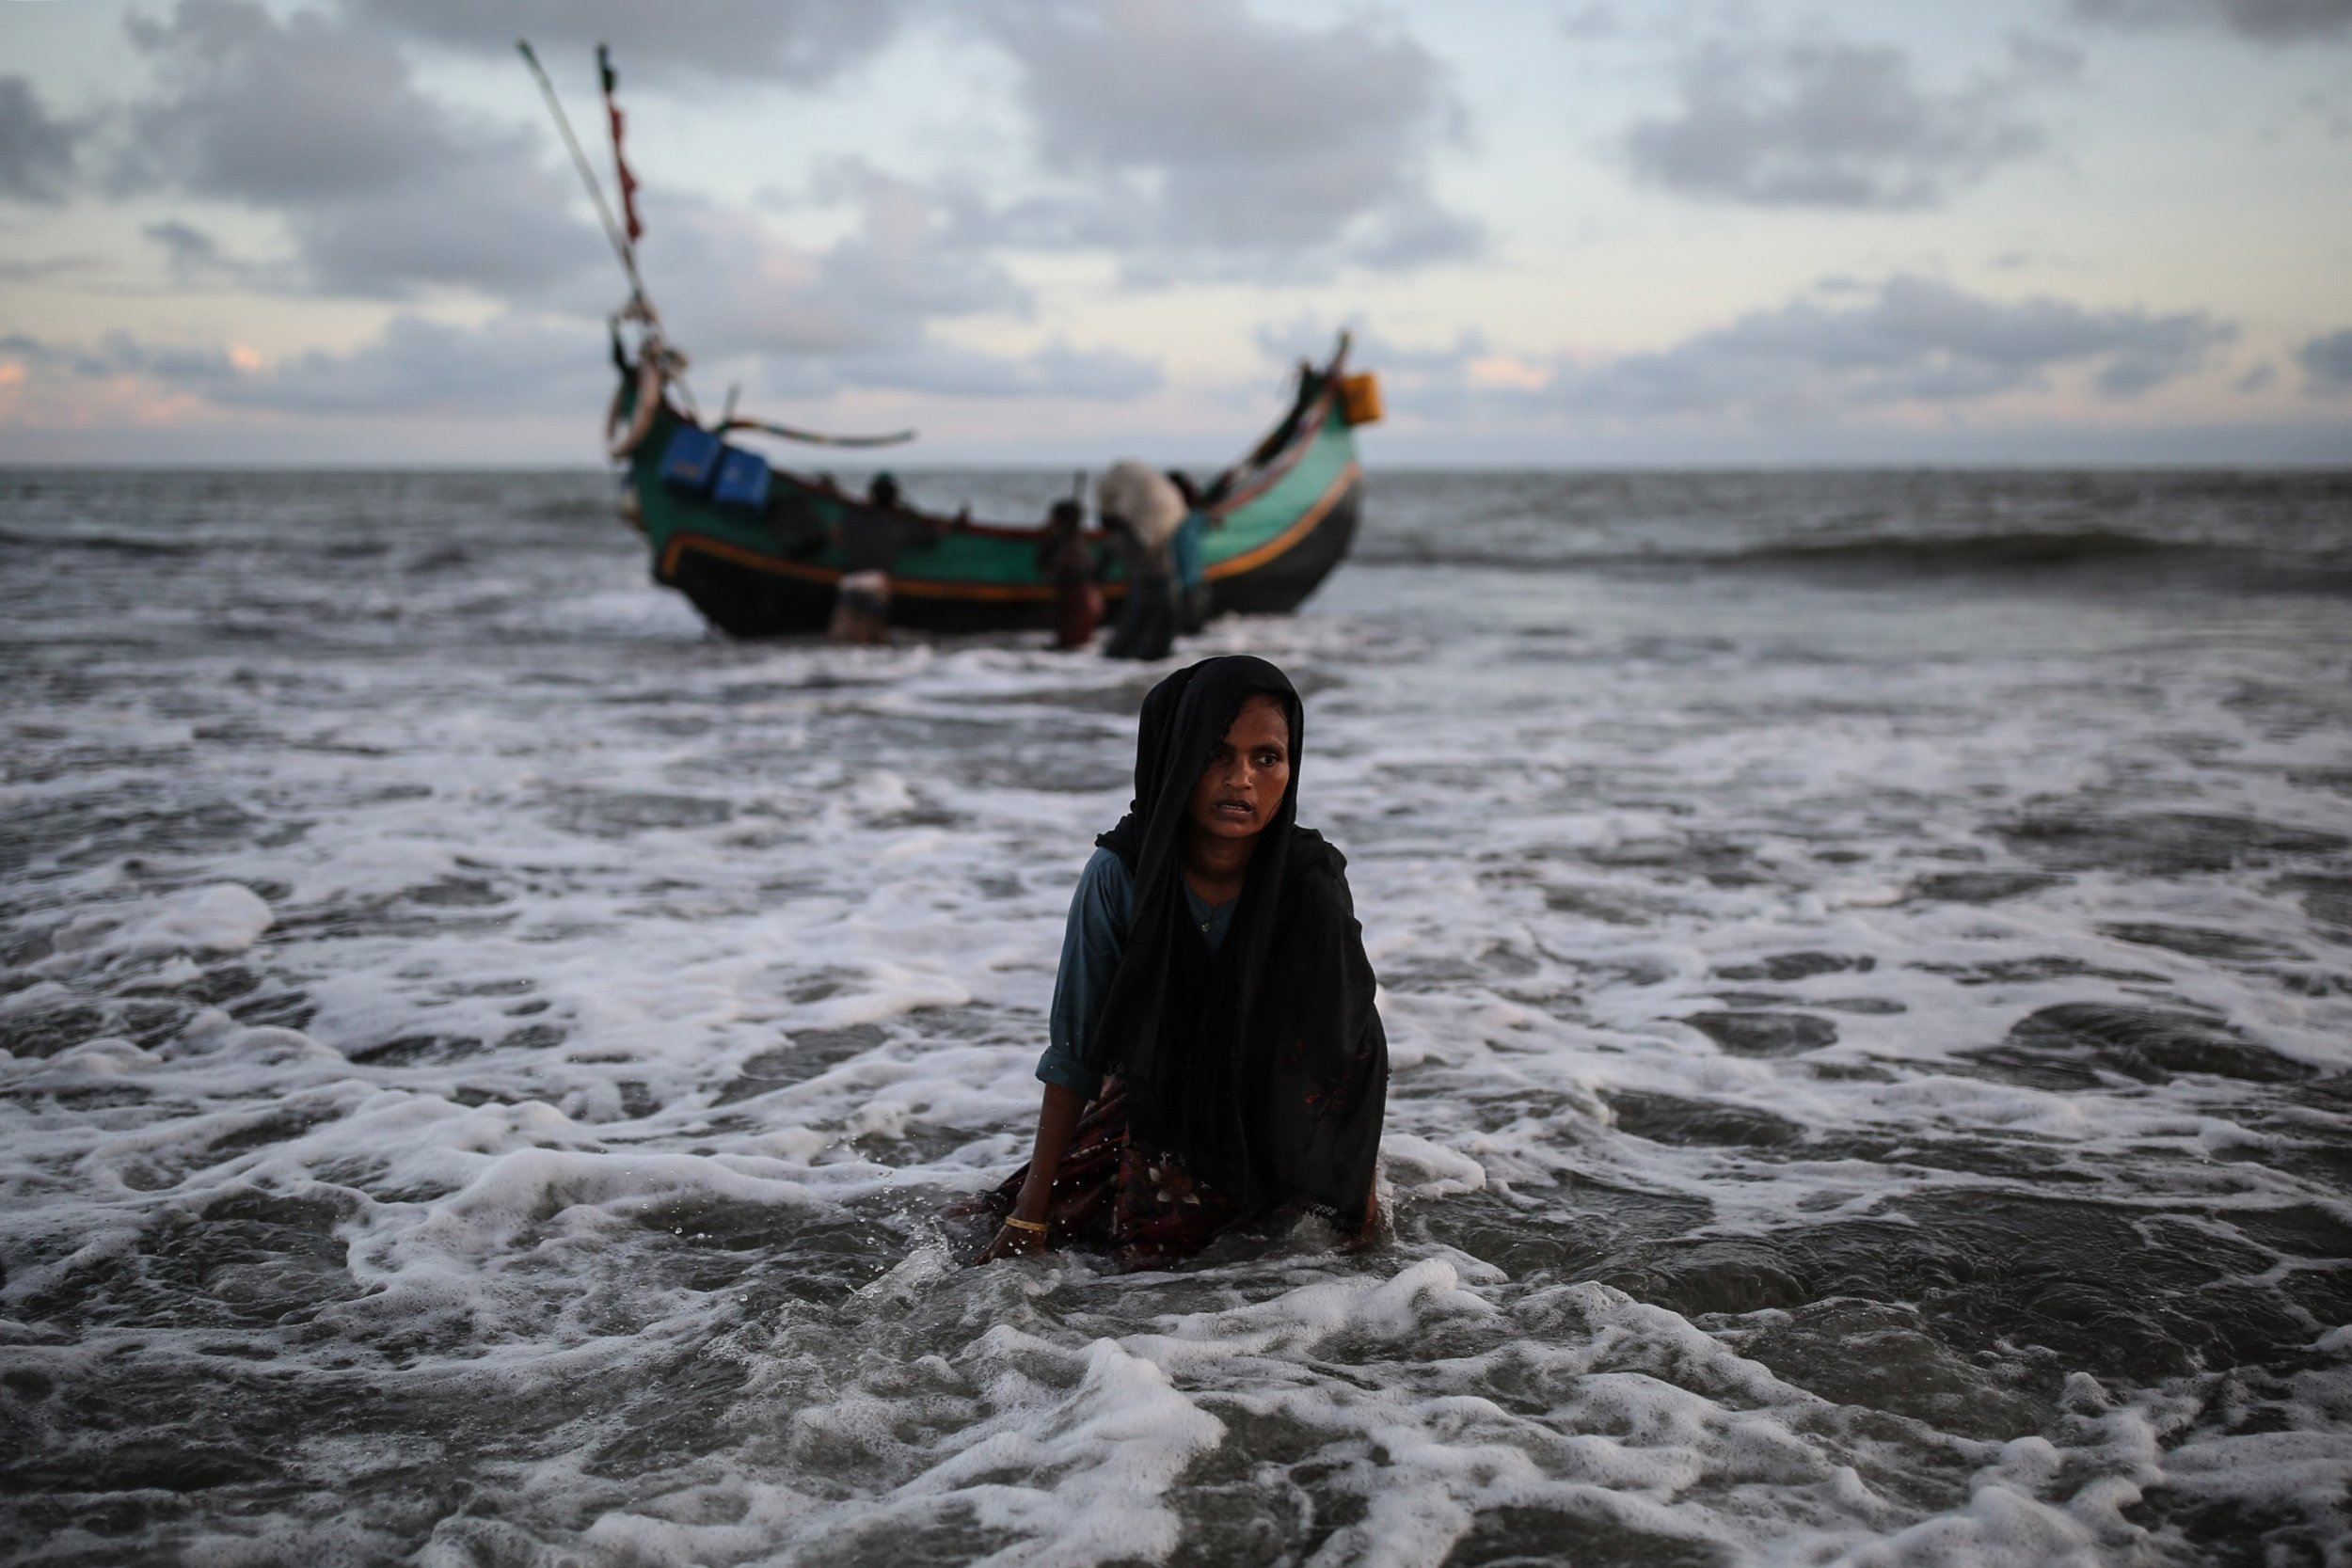 09_15_Rohingya_Woman